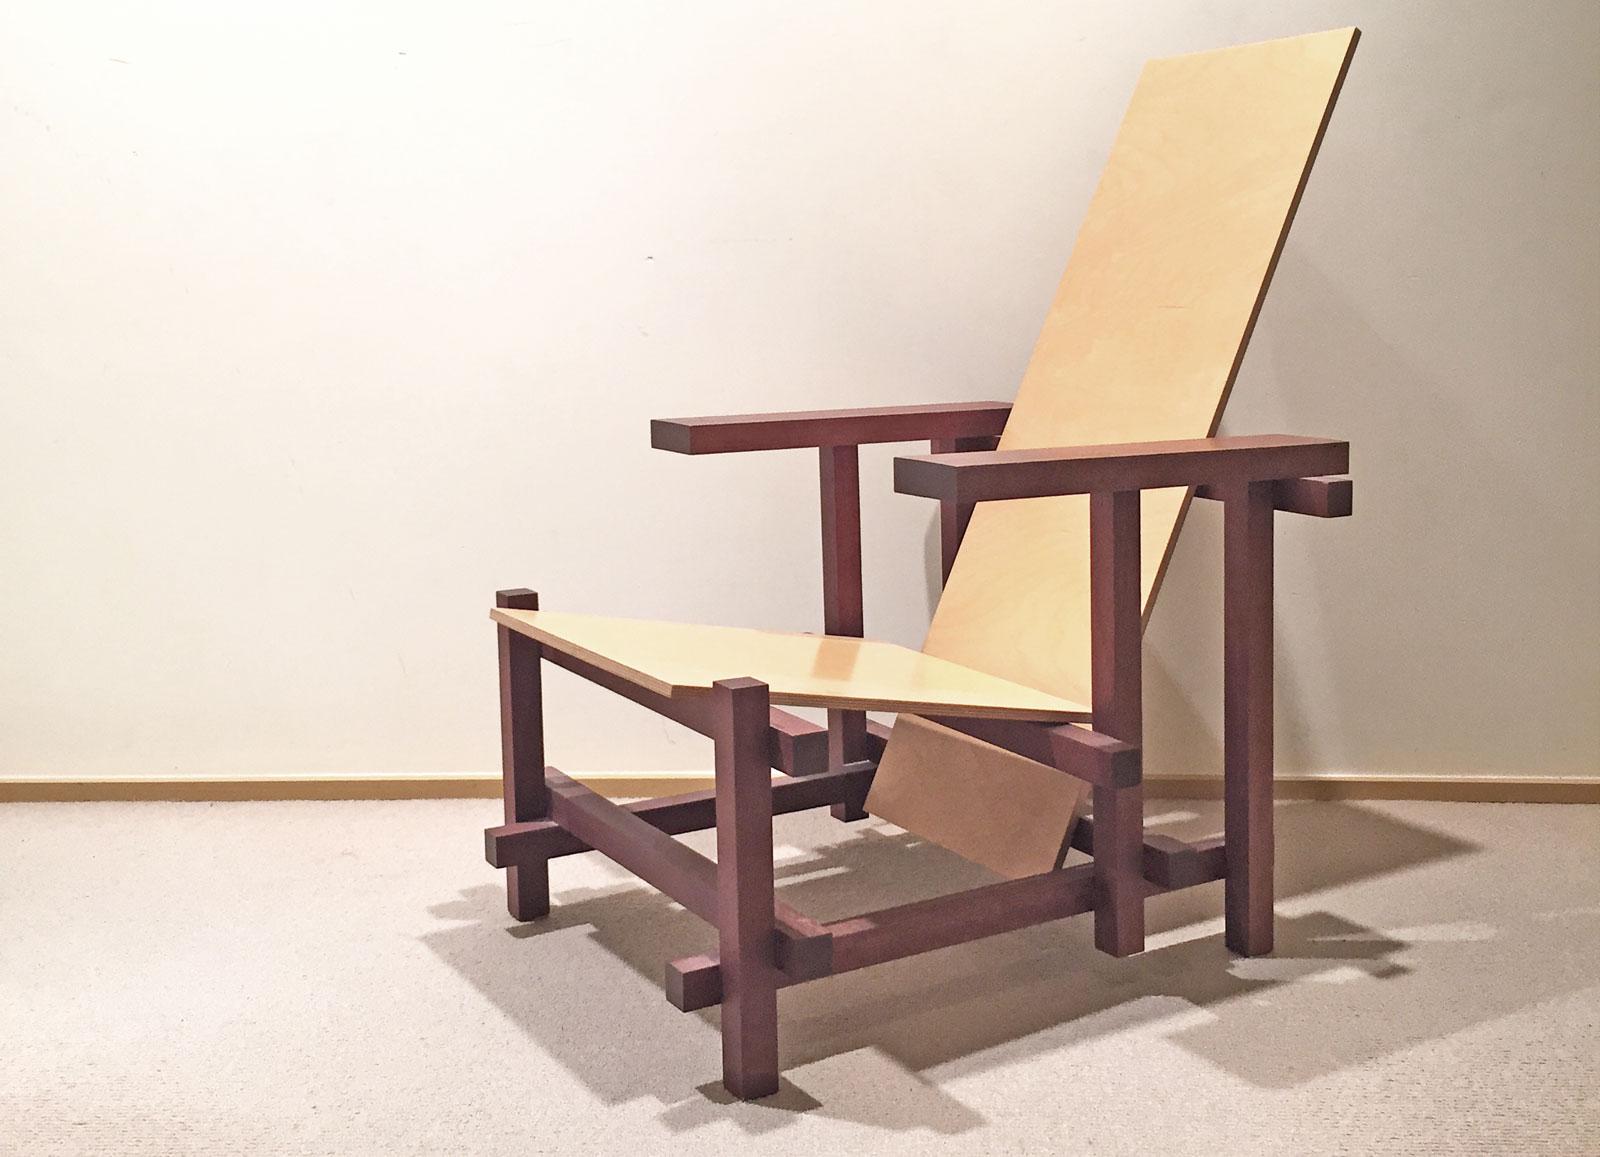 shell chair knock off narrow wheelchair original vs copy a case for offs build blog